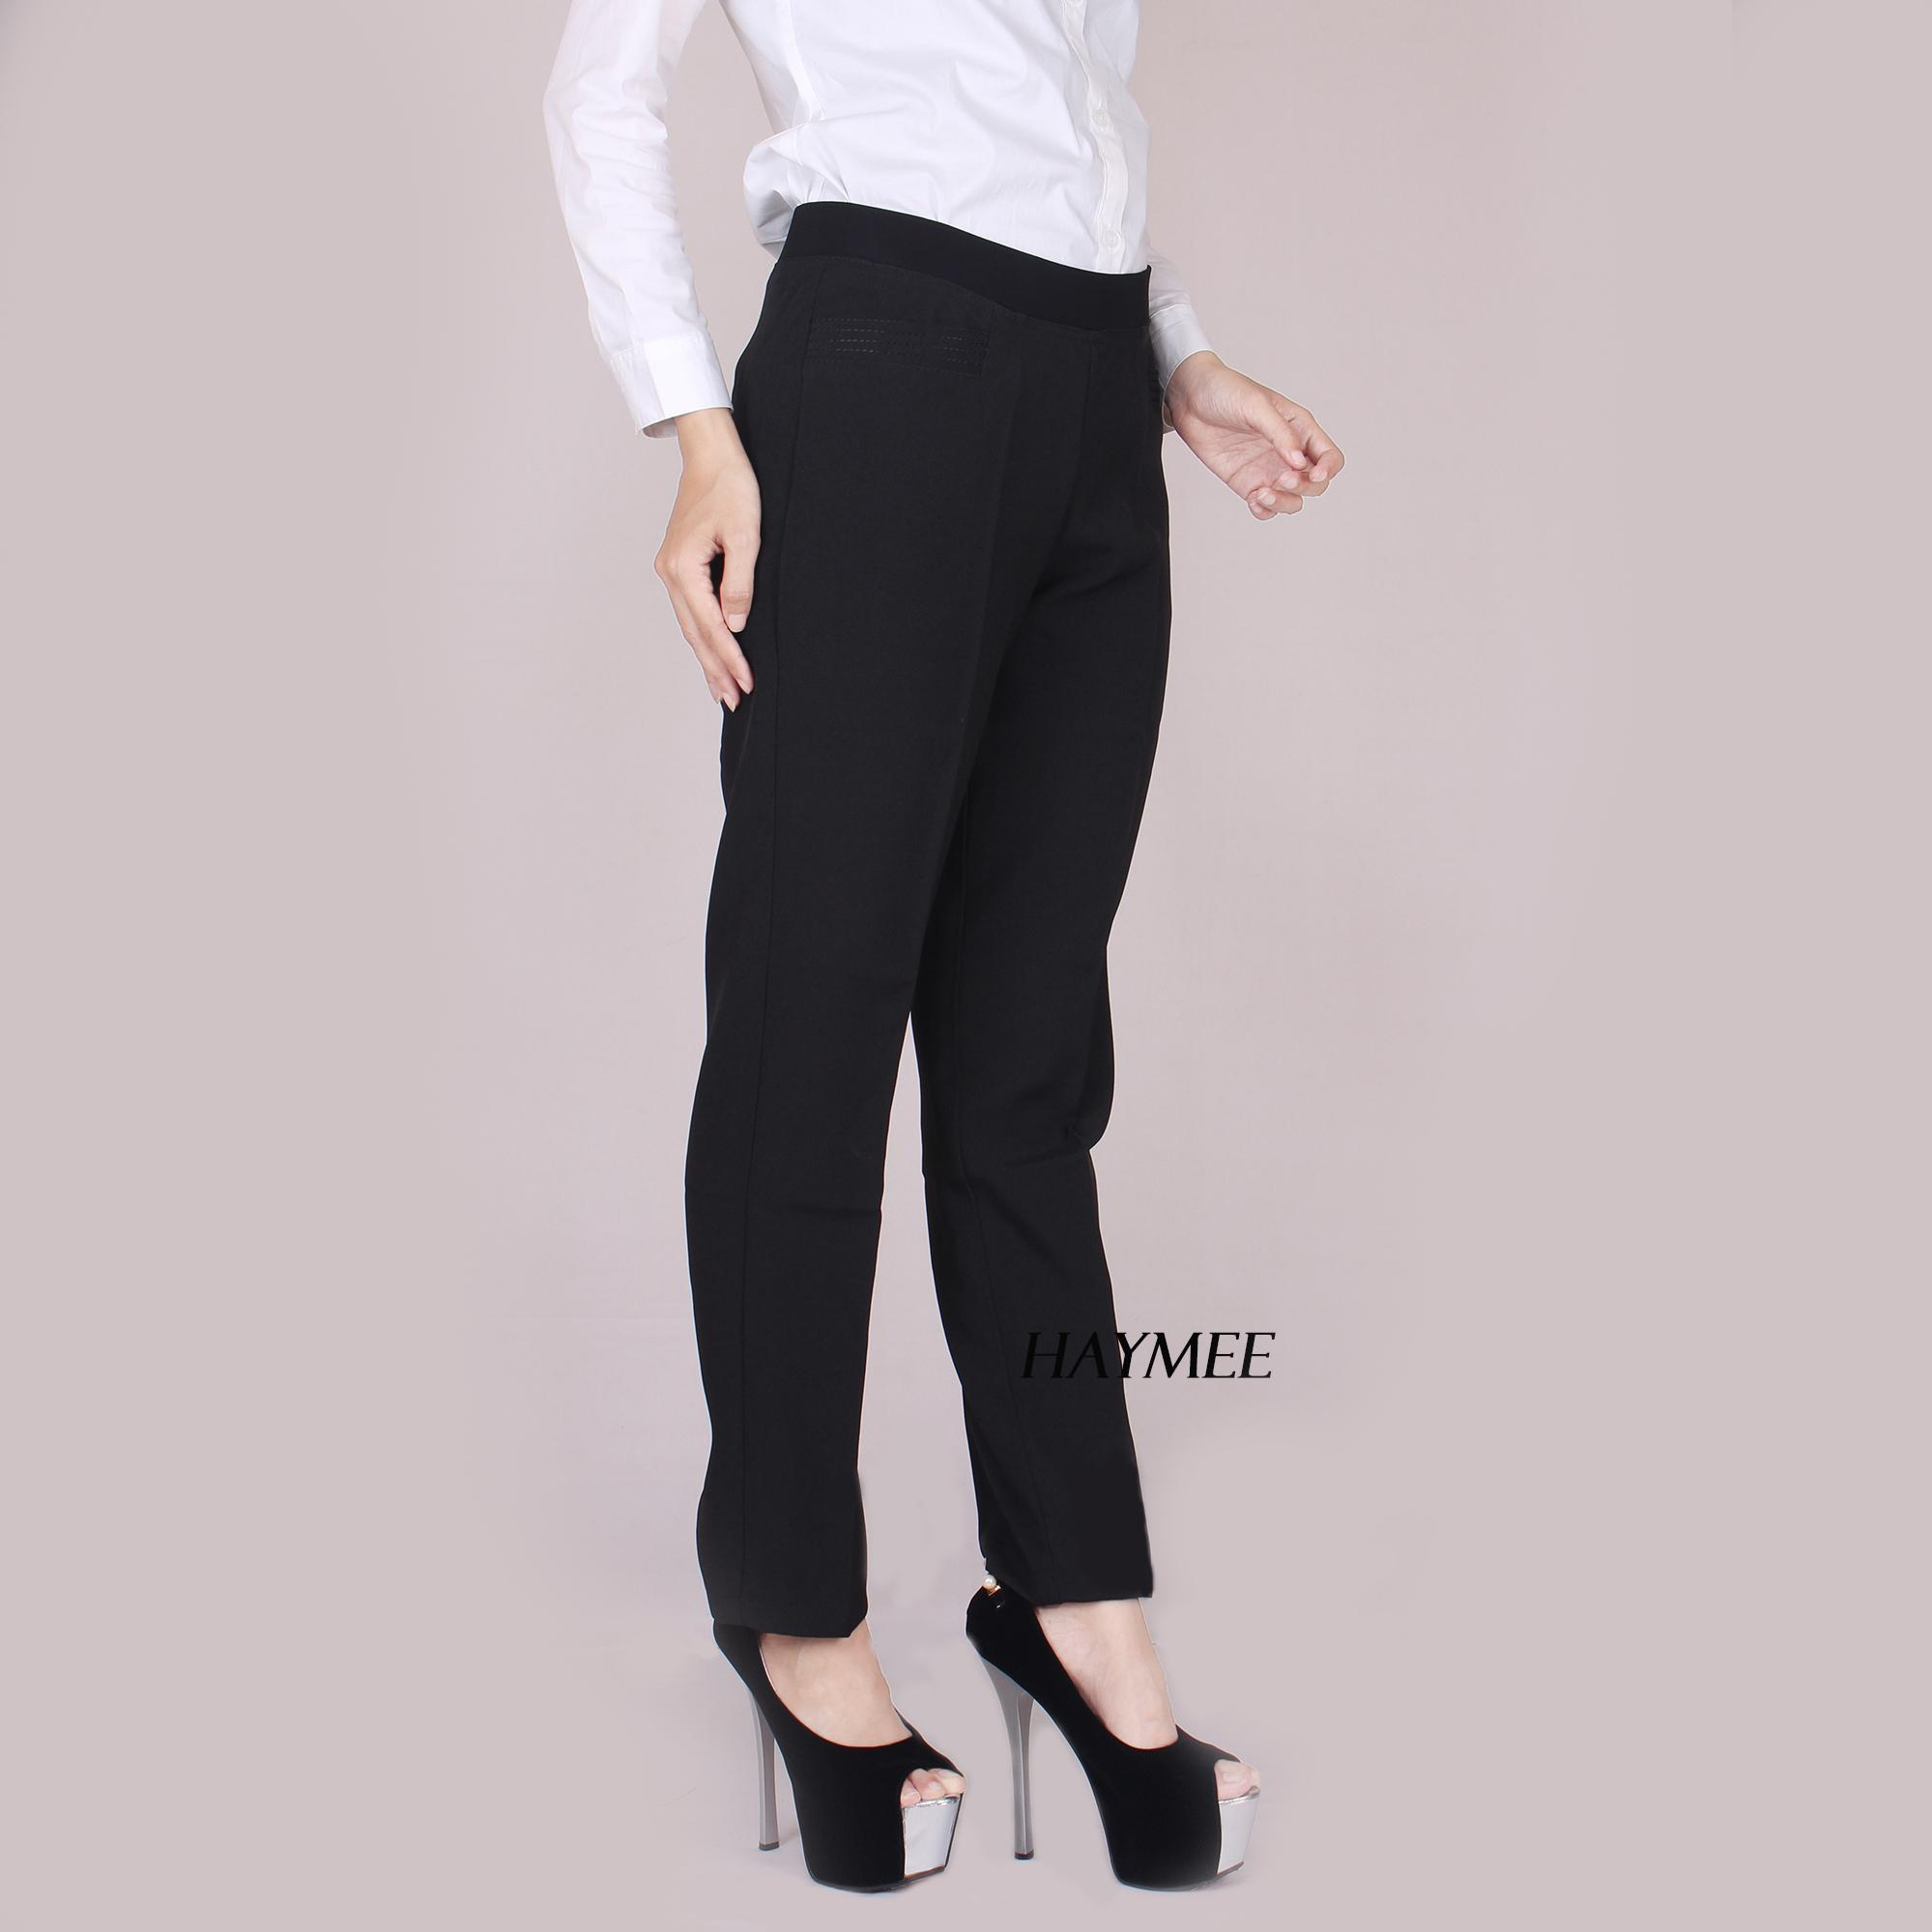 HaymeeStore Celana Kantor Wanita Pinggang Karet Celana Kerja Cewek Celana Formal Cewe Karet Keliling Premium Casual